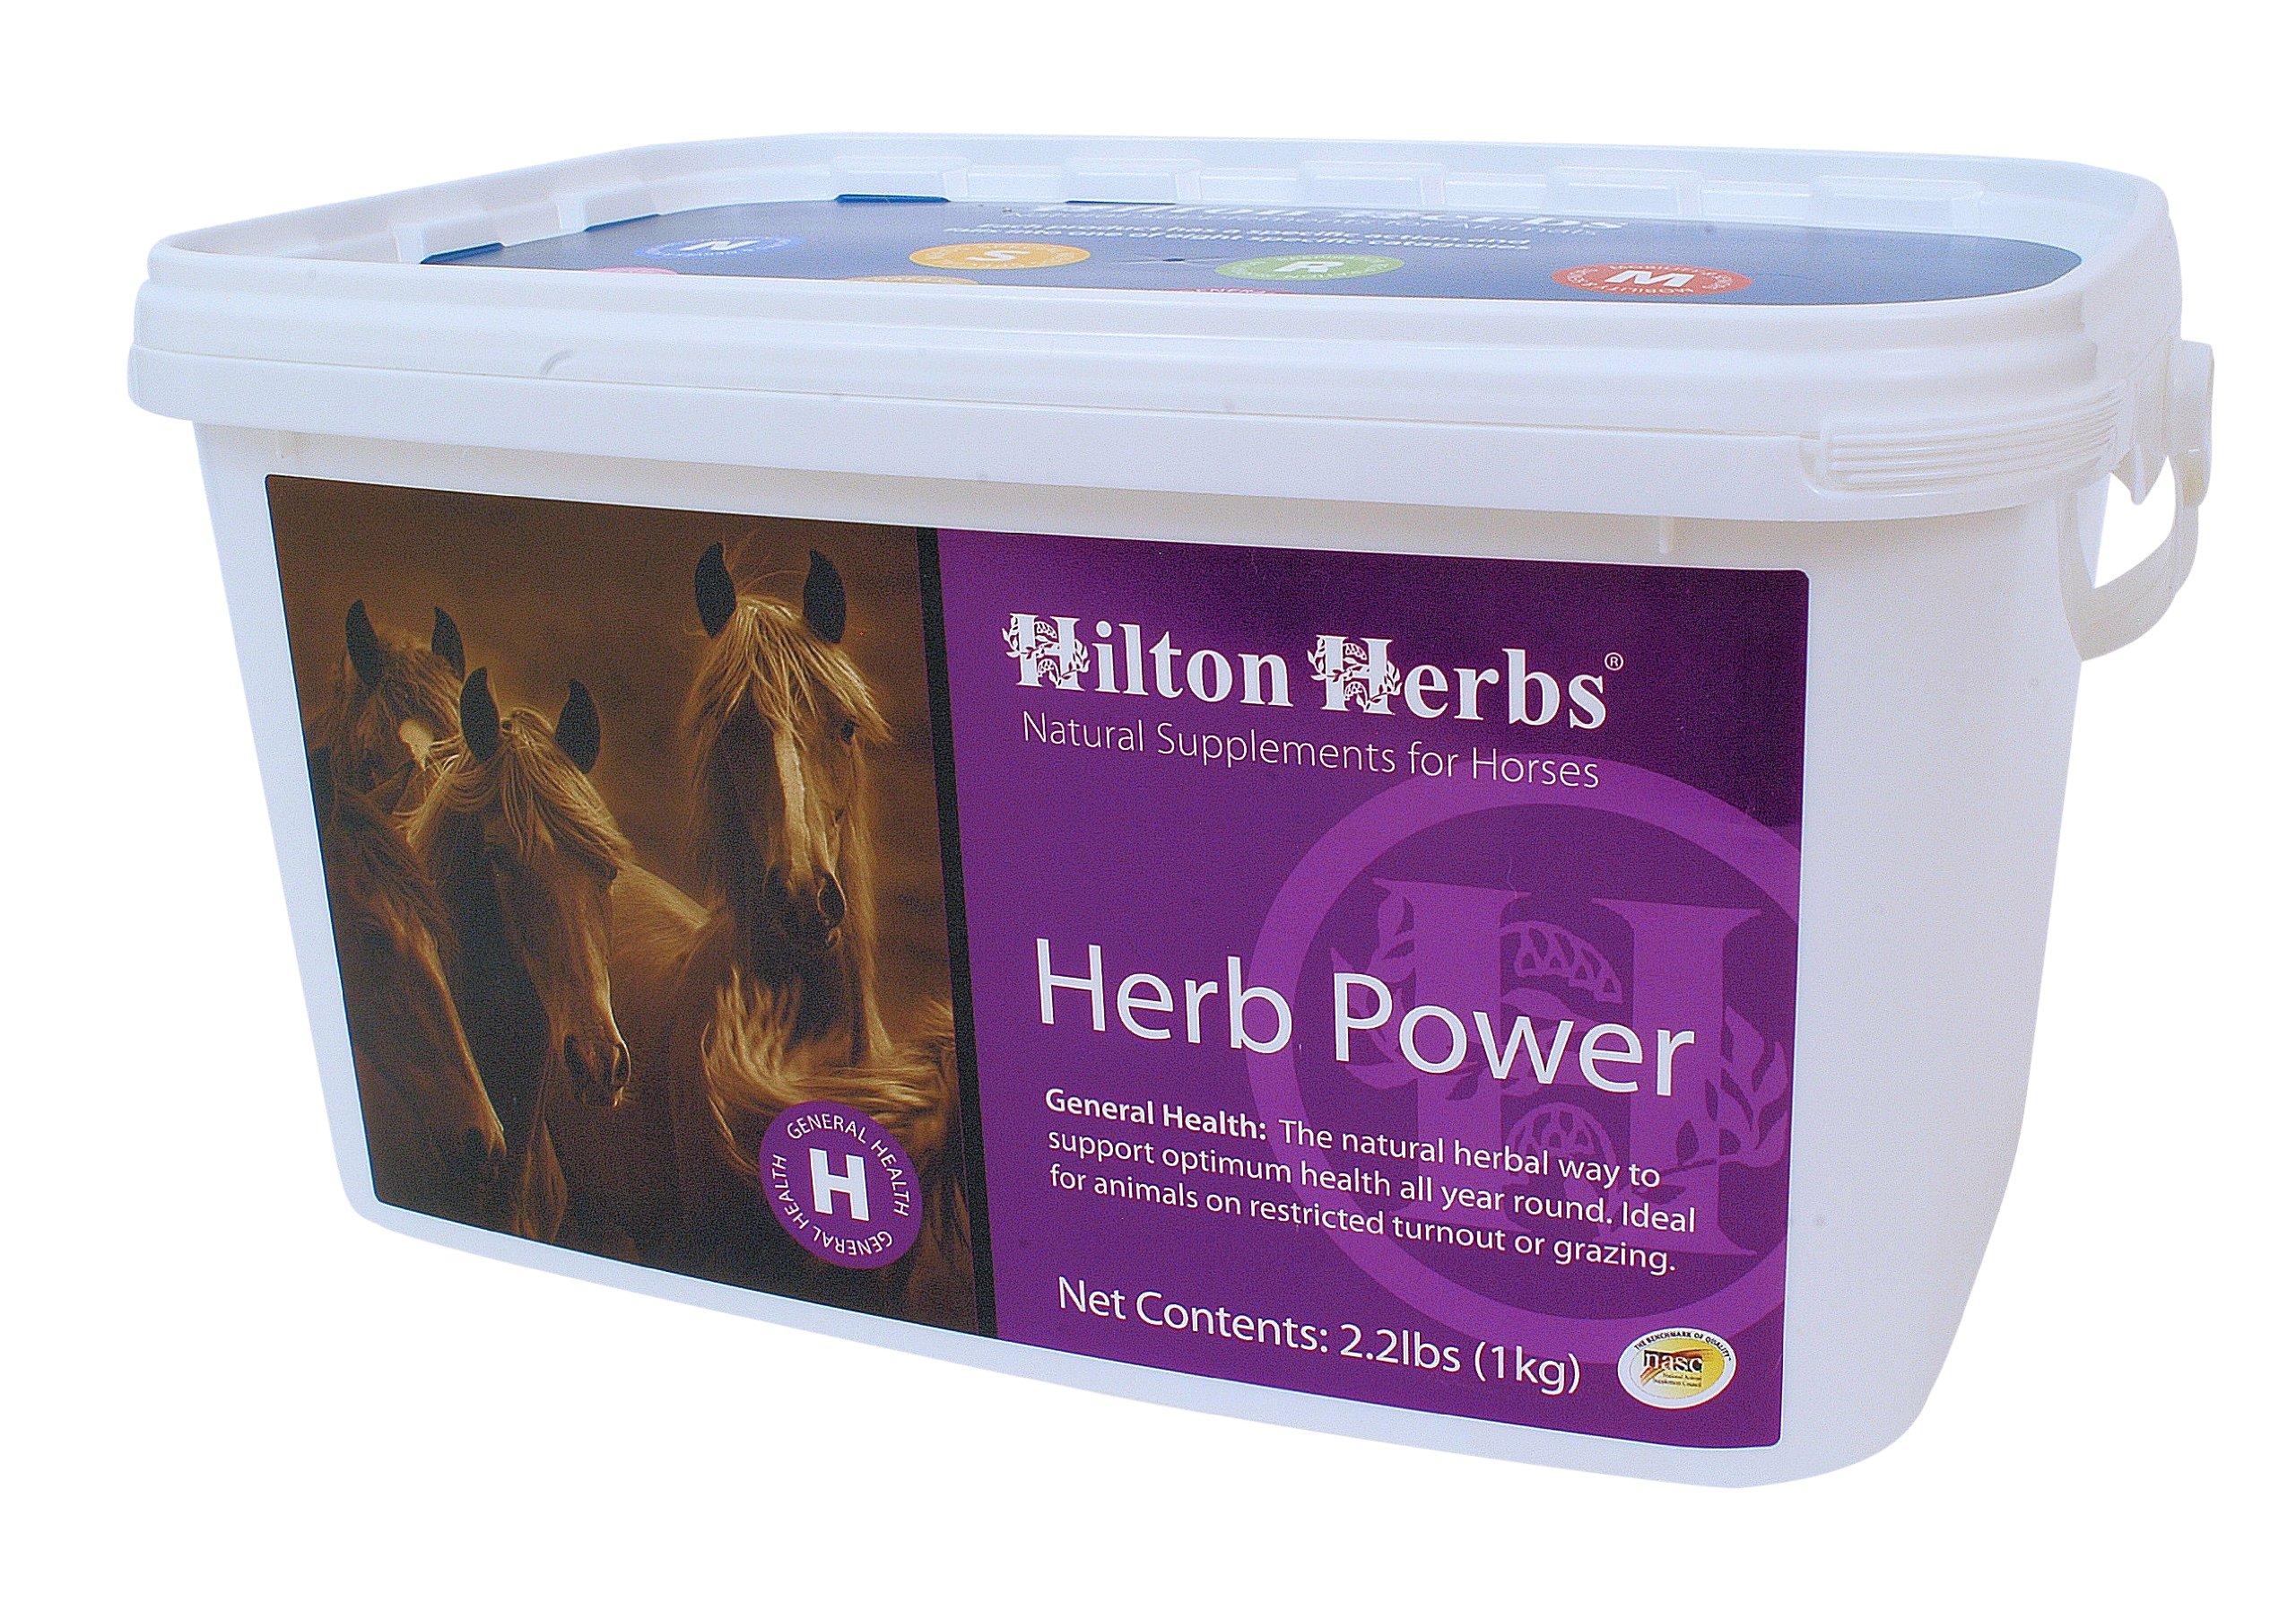 Hilton Herbs General Herb Power Natural Vitamin Supplement for Horses, 1kg Tub